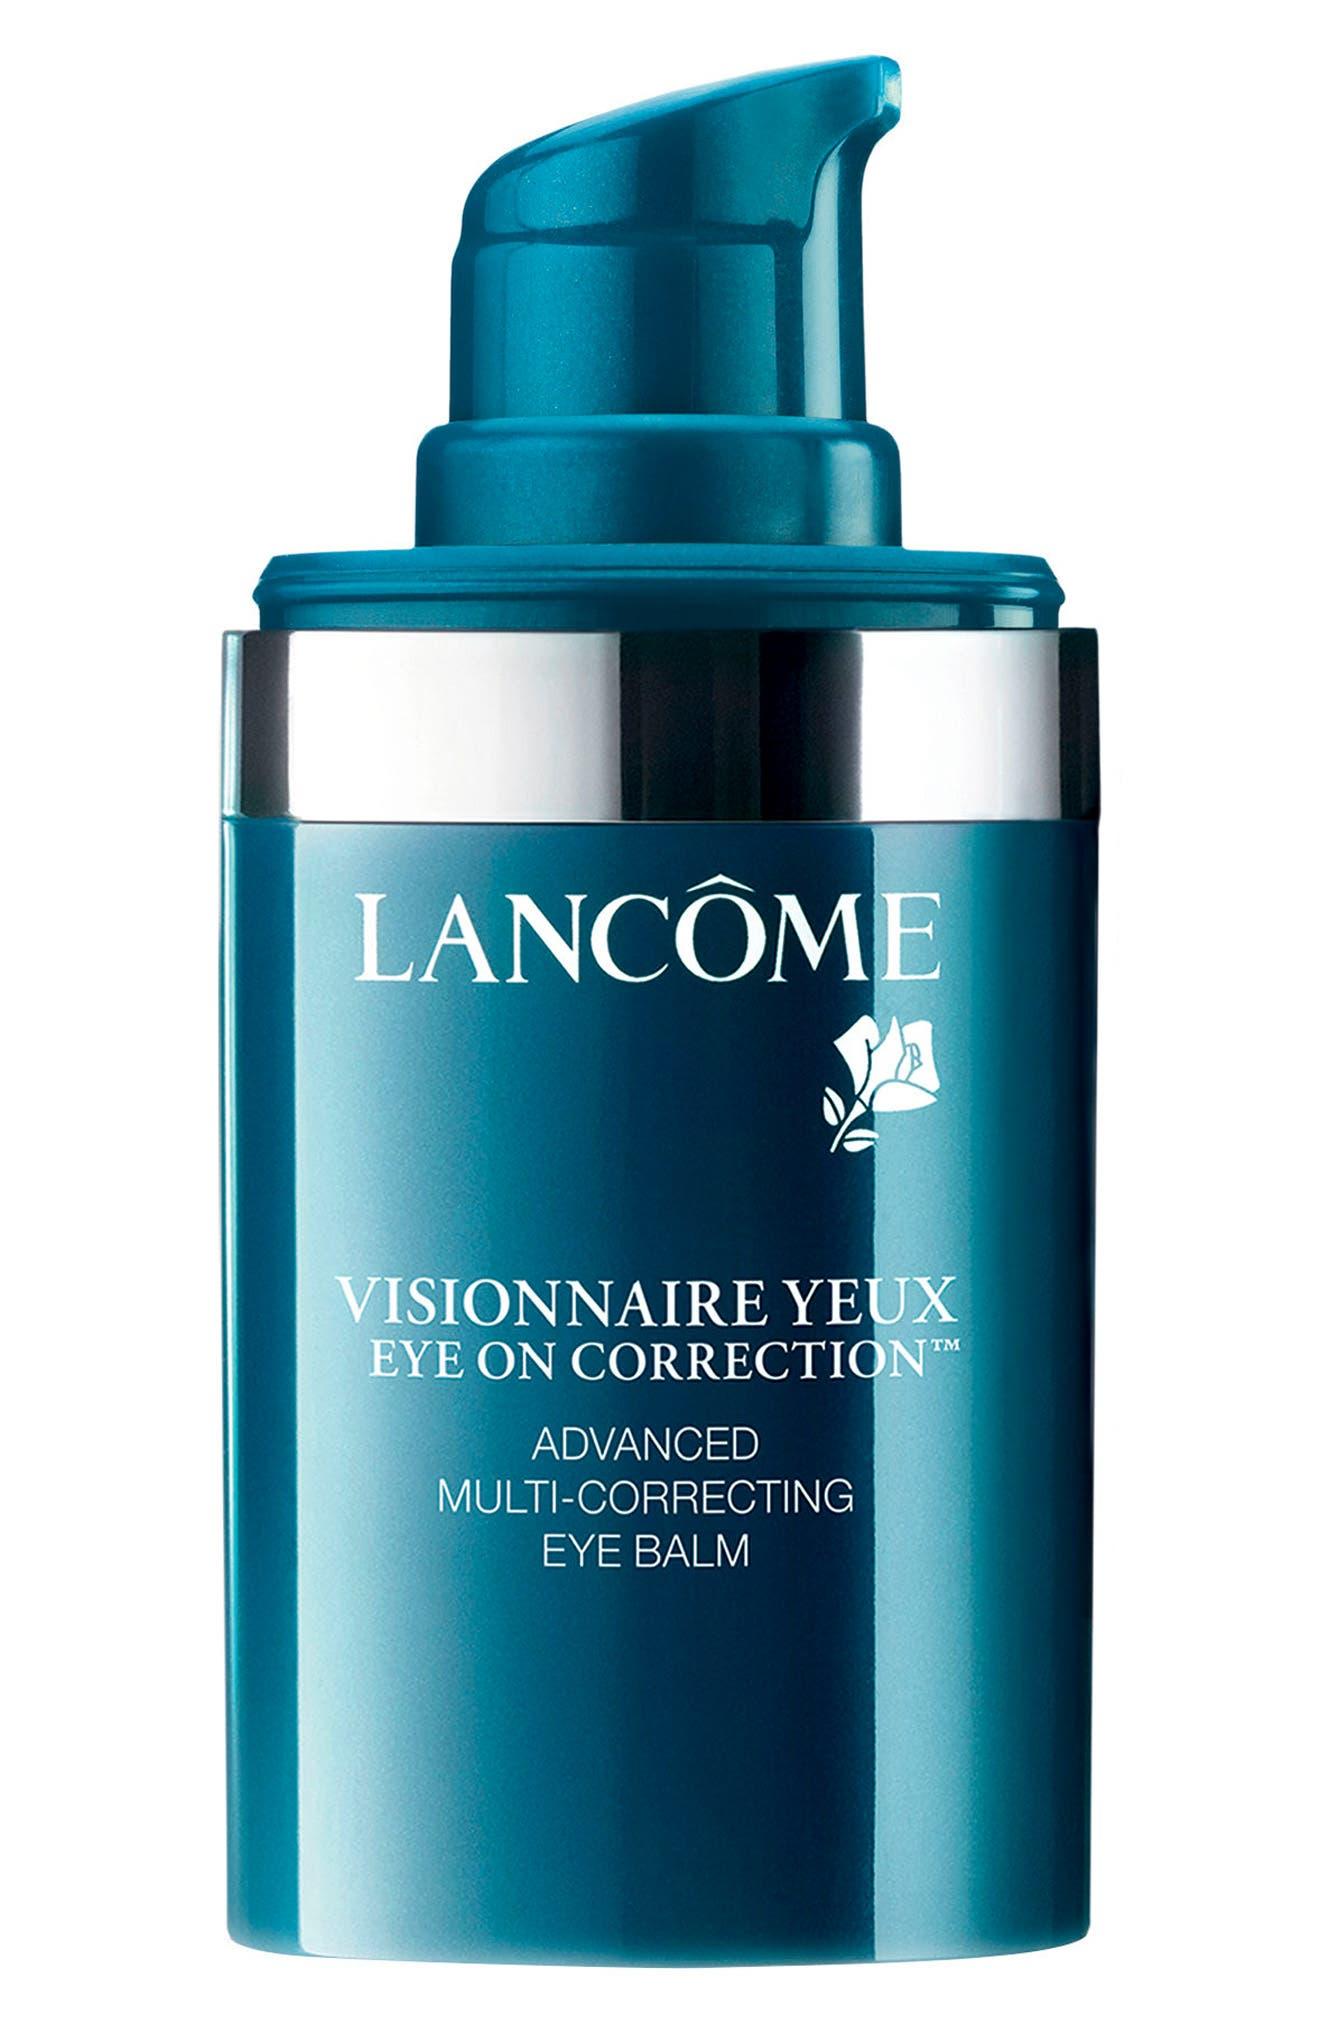 LANCÔME Visionnaire Yeux Eye on Correction<sup>®</sup> Advanced Multi-Correcting Eye Balm, Main, color, NO COLOR